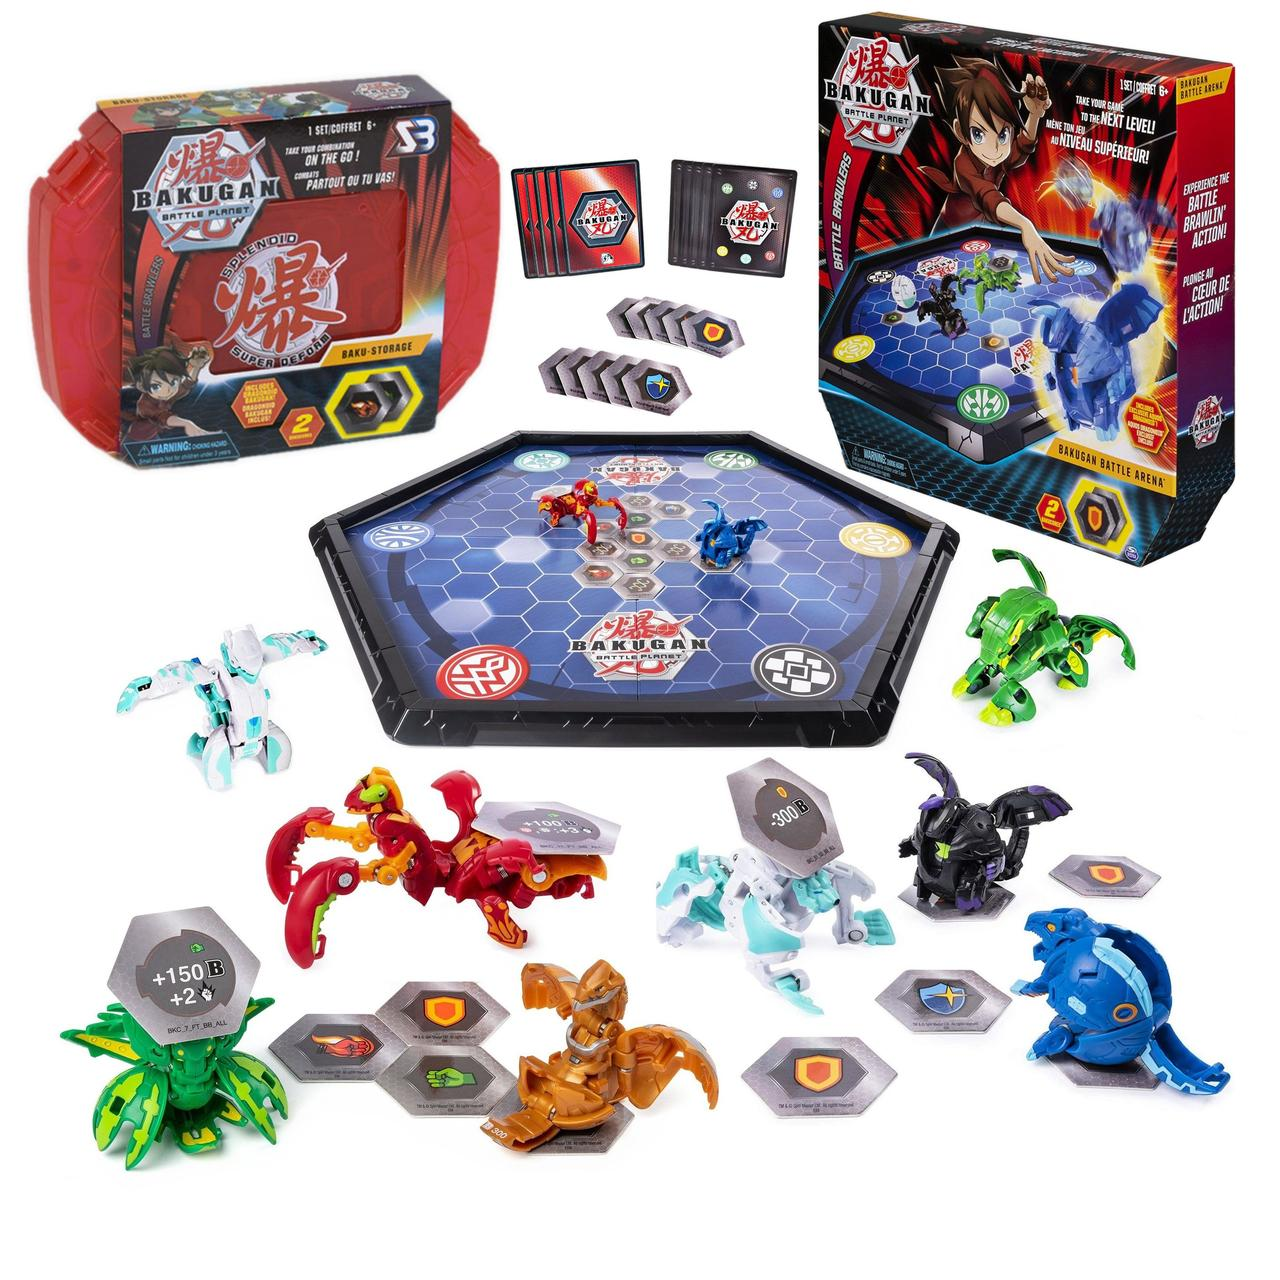 Bakugan Battle planet, бакуганы 8 шт. + арена + красный бокс для бакуганов